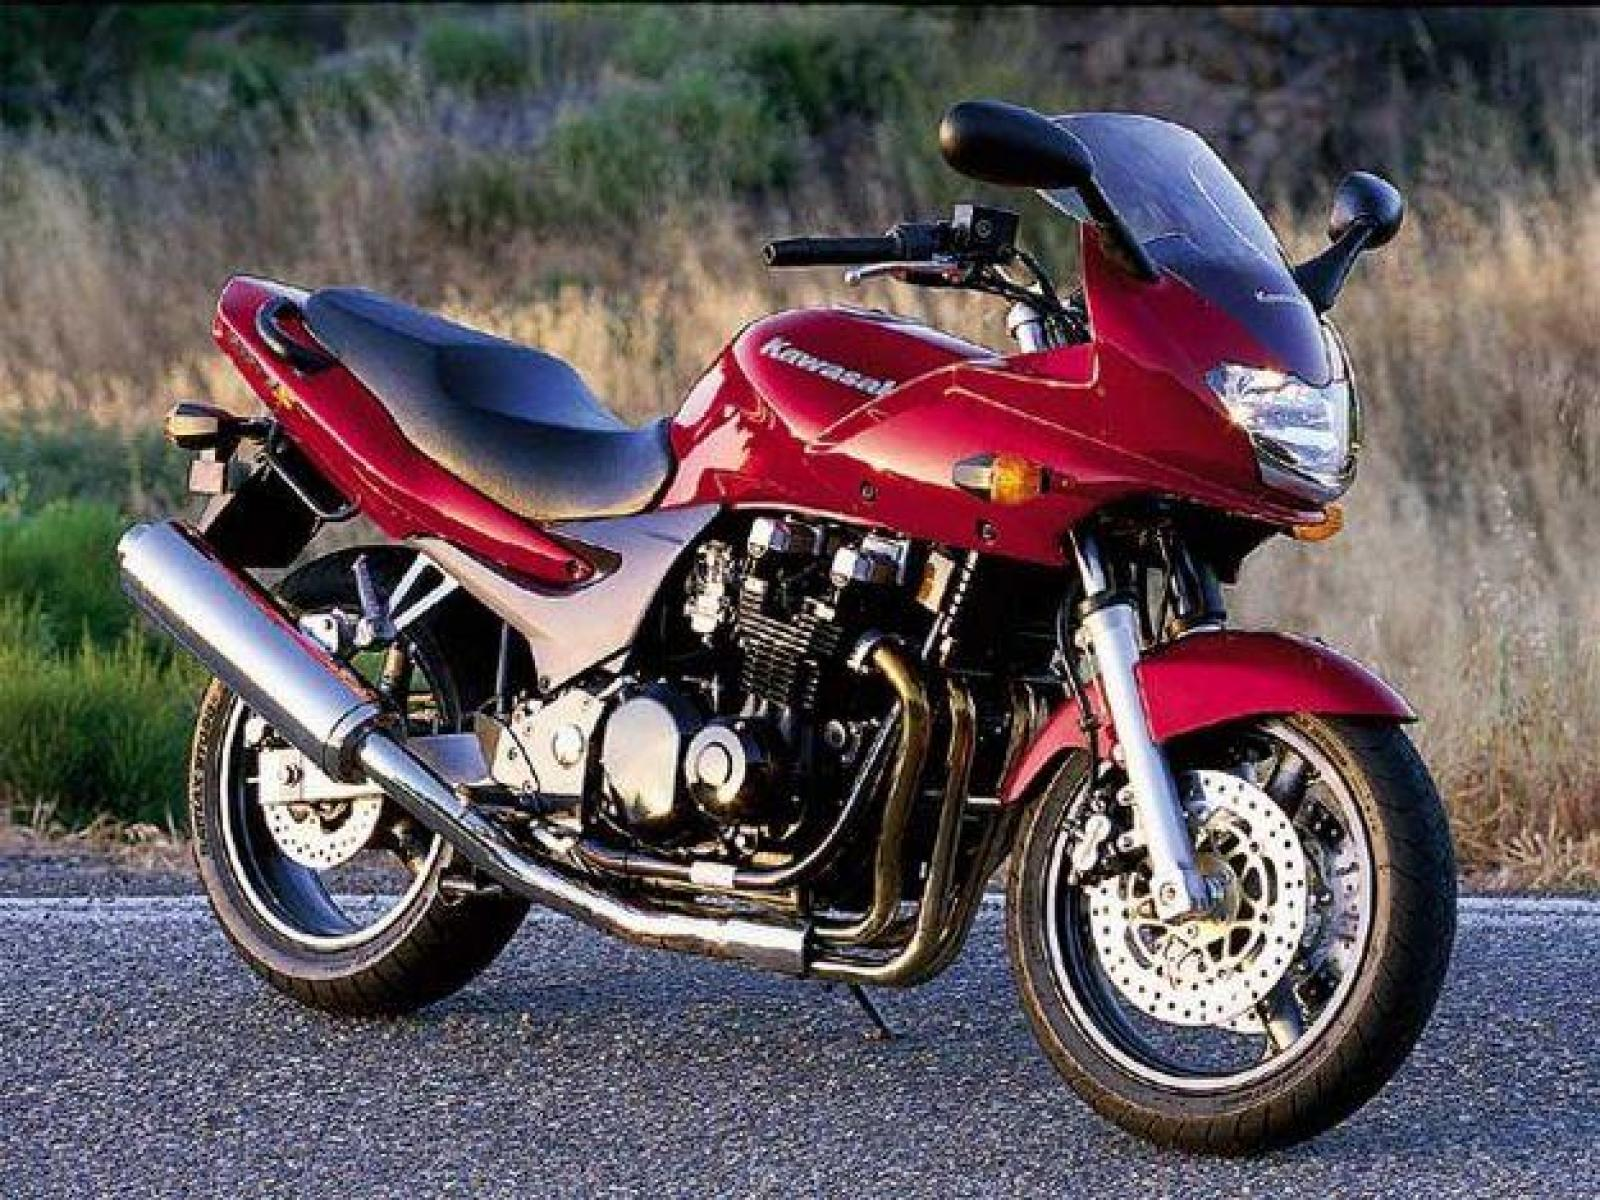 Тест-драйв мотоцикла Kawasaki ZR-7